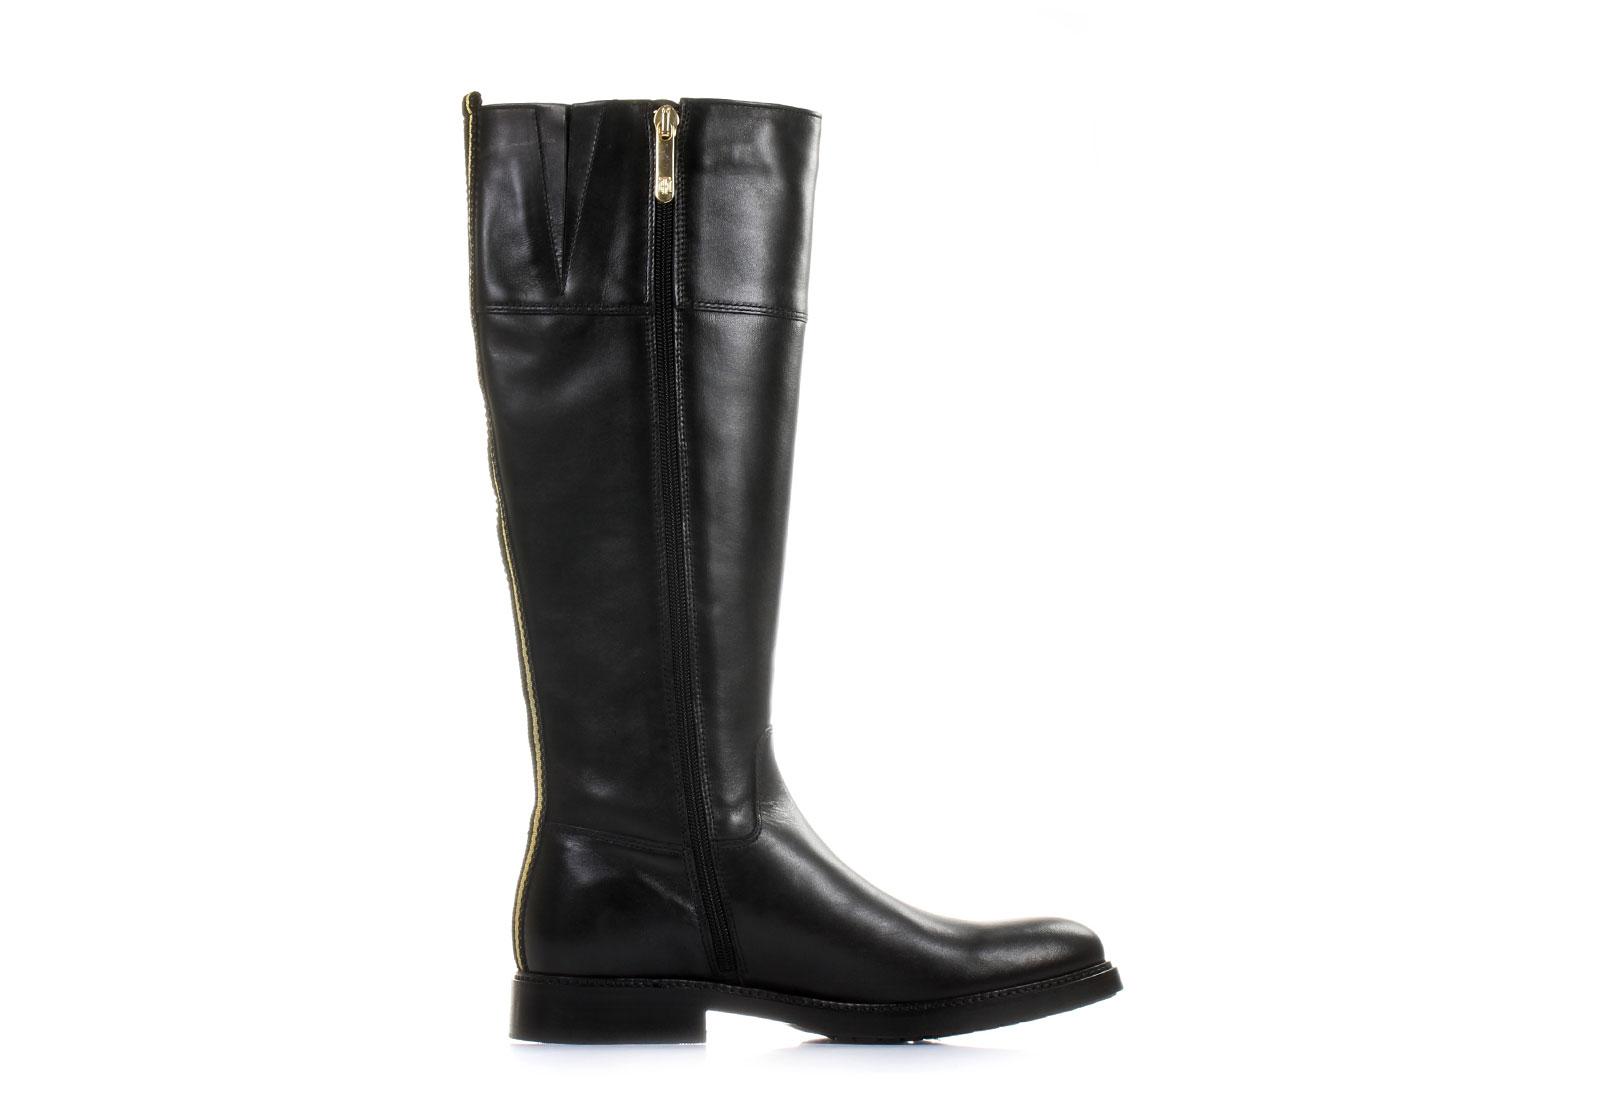 Tommy Hilfiger Csizma - Holly 13a - 16F-1508-990 - Office Shoes ... 463fc0b9c4